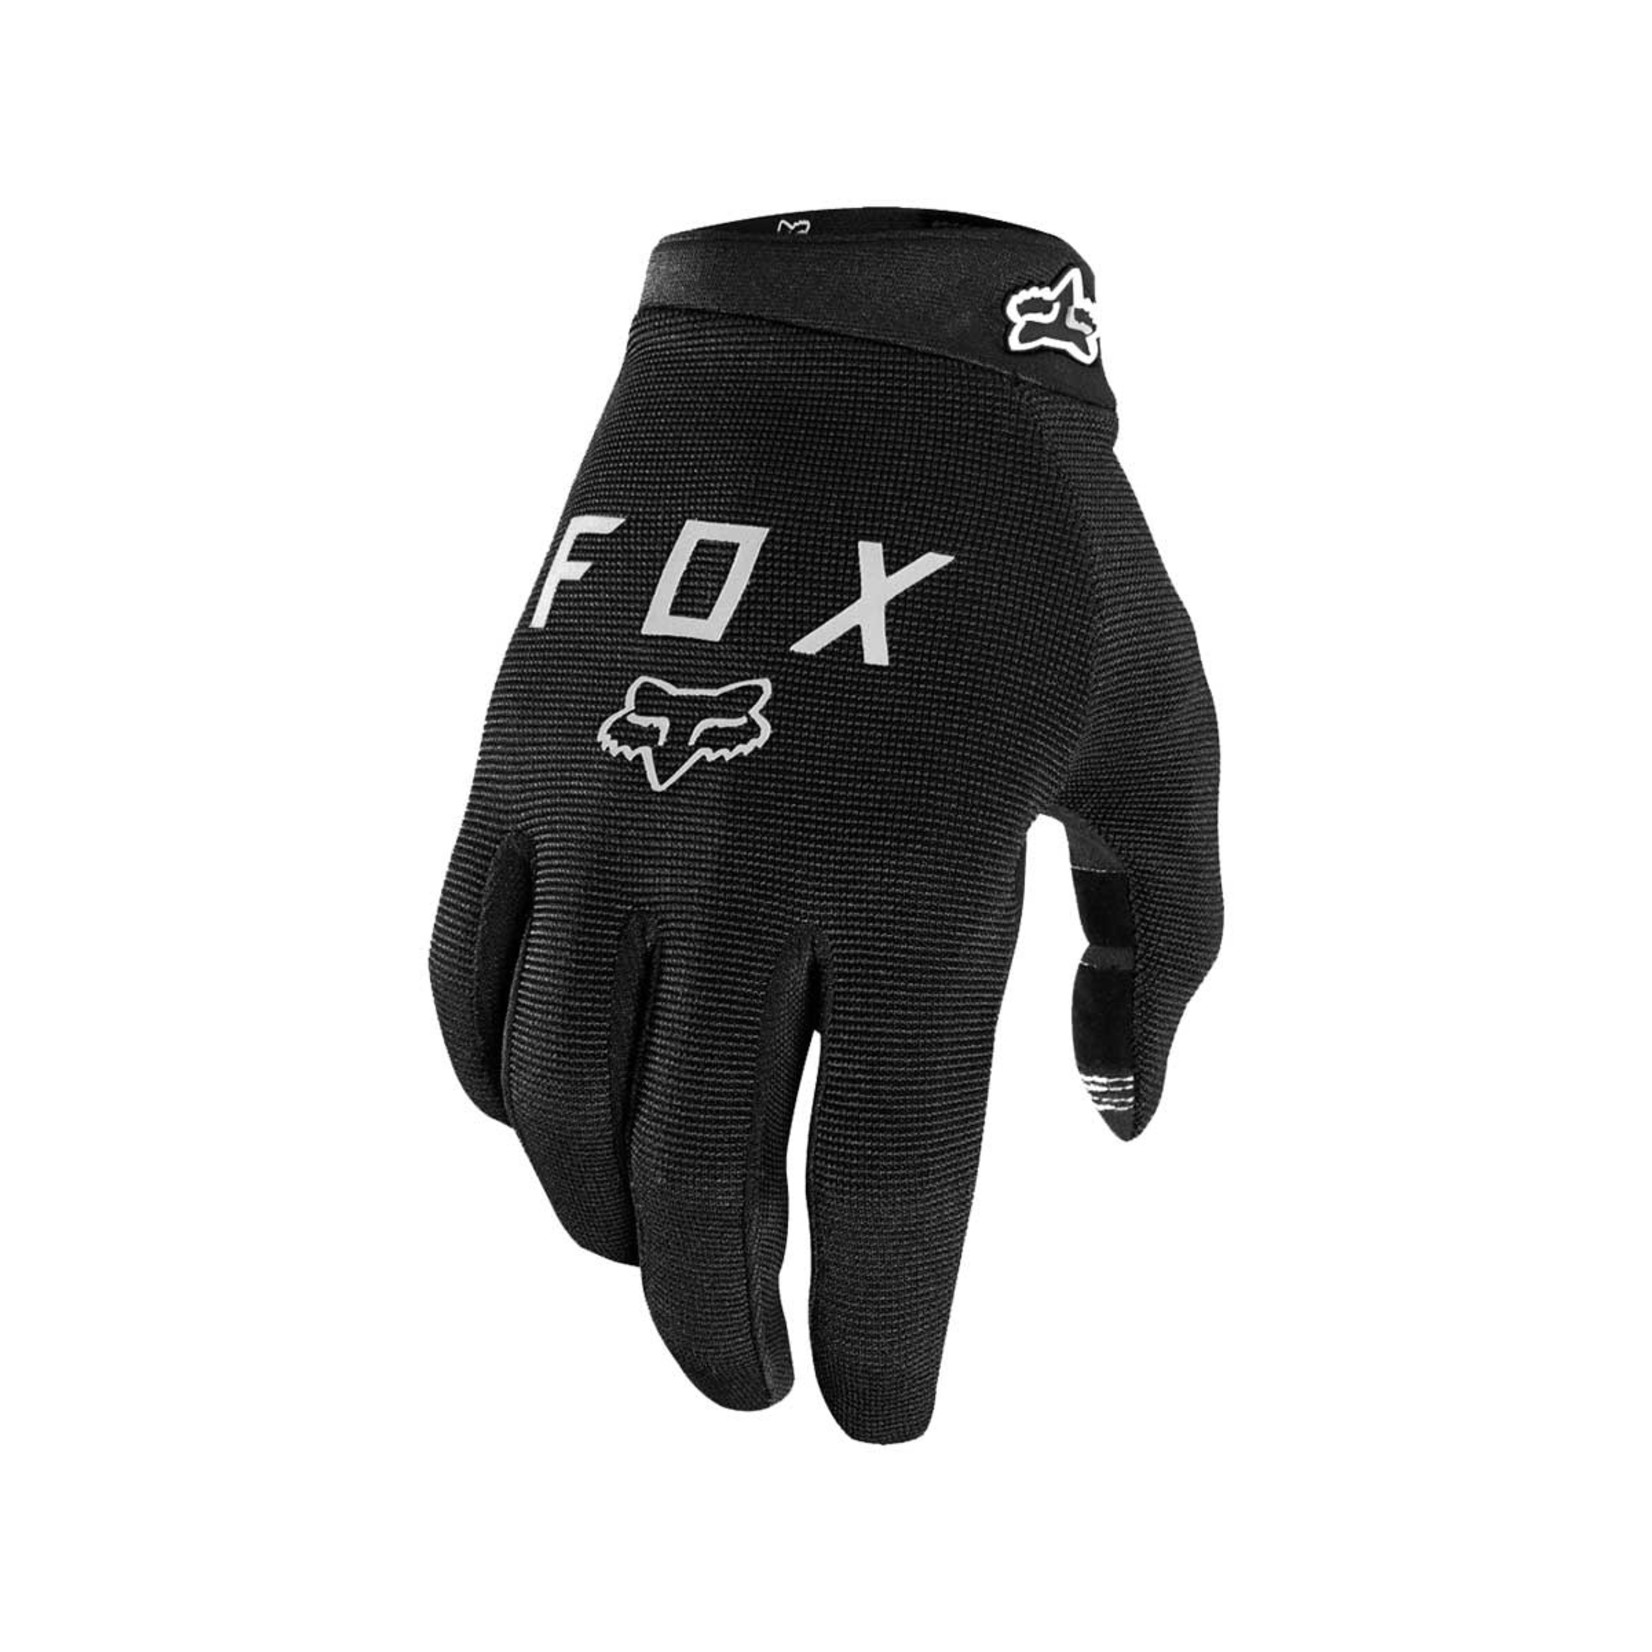 Fox Fox Glove Ranger youth medium